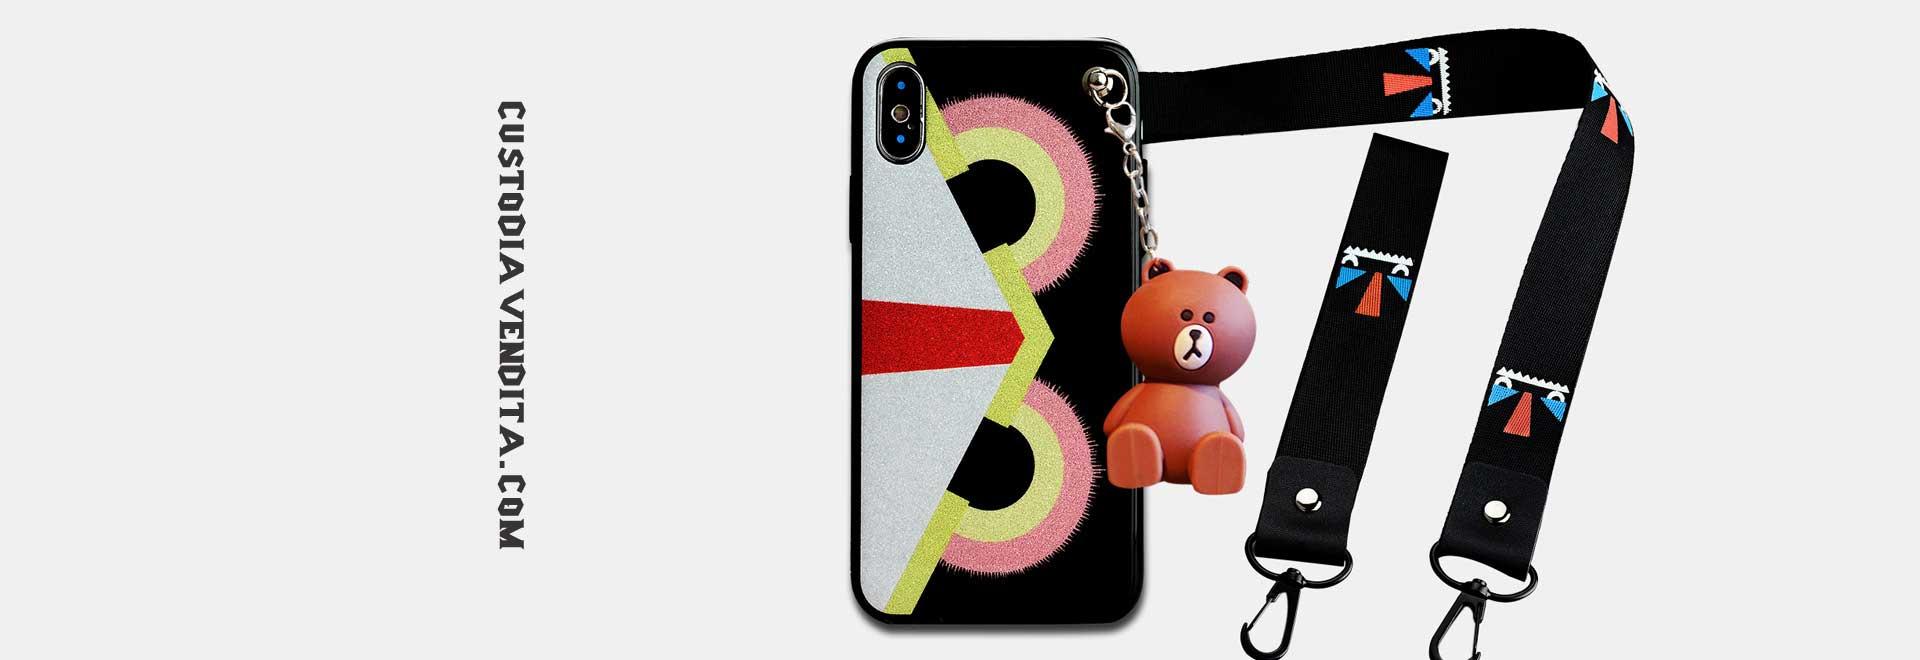 Custodia iPhone X Vendita